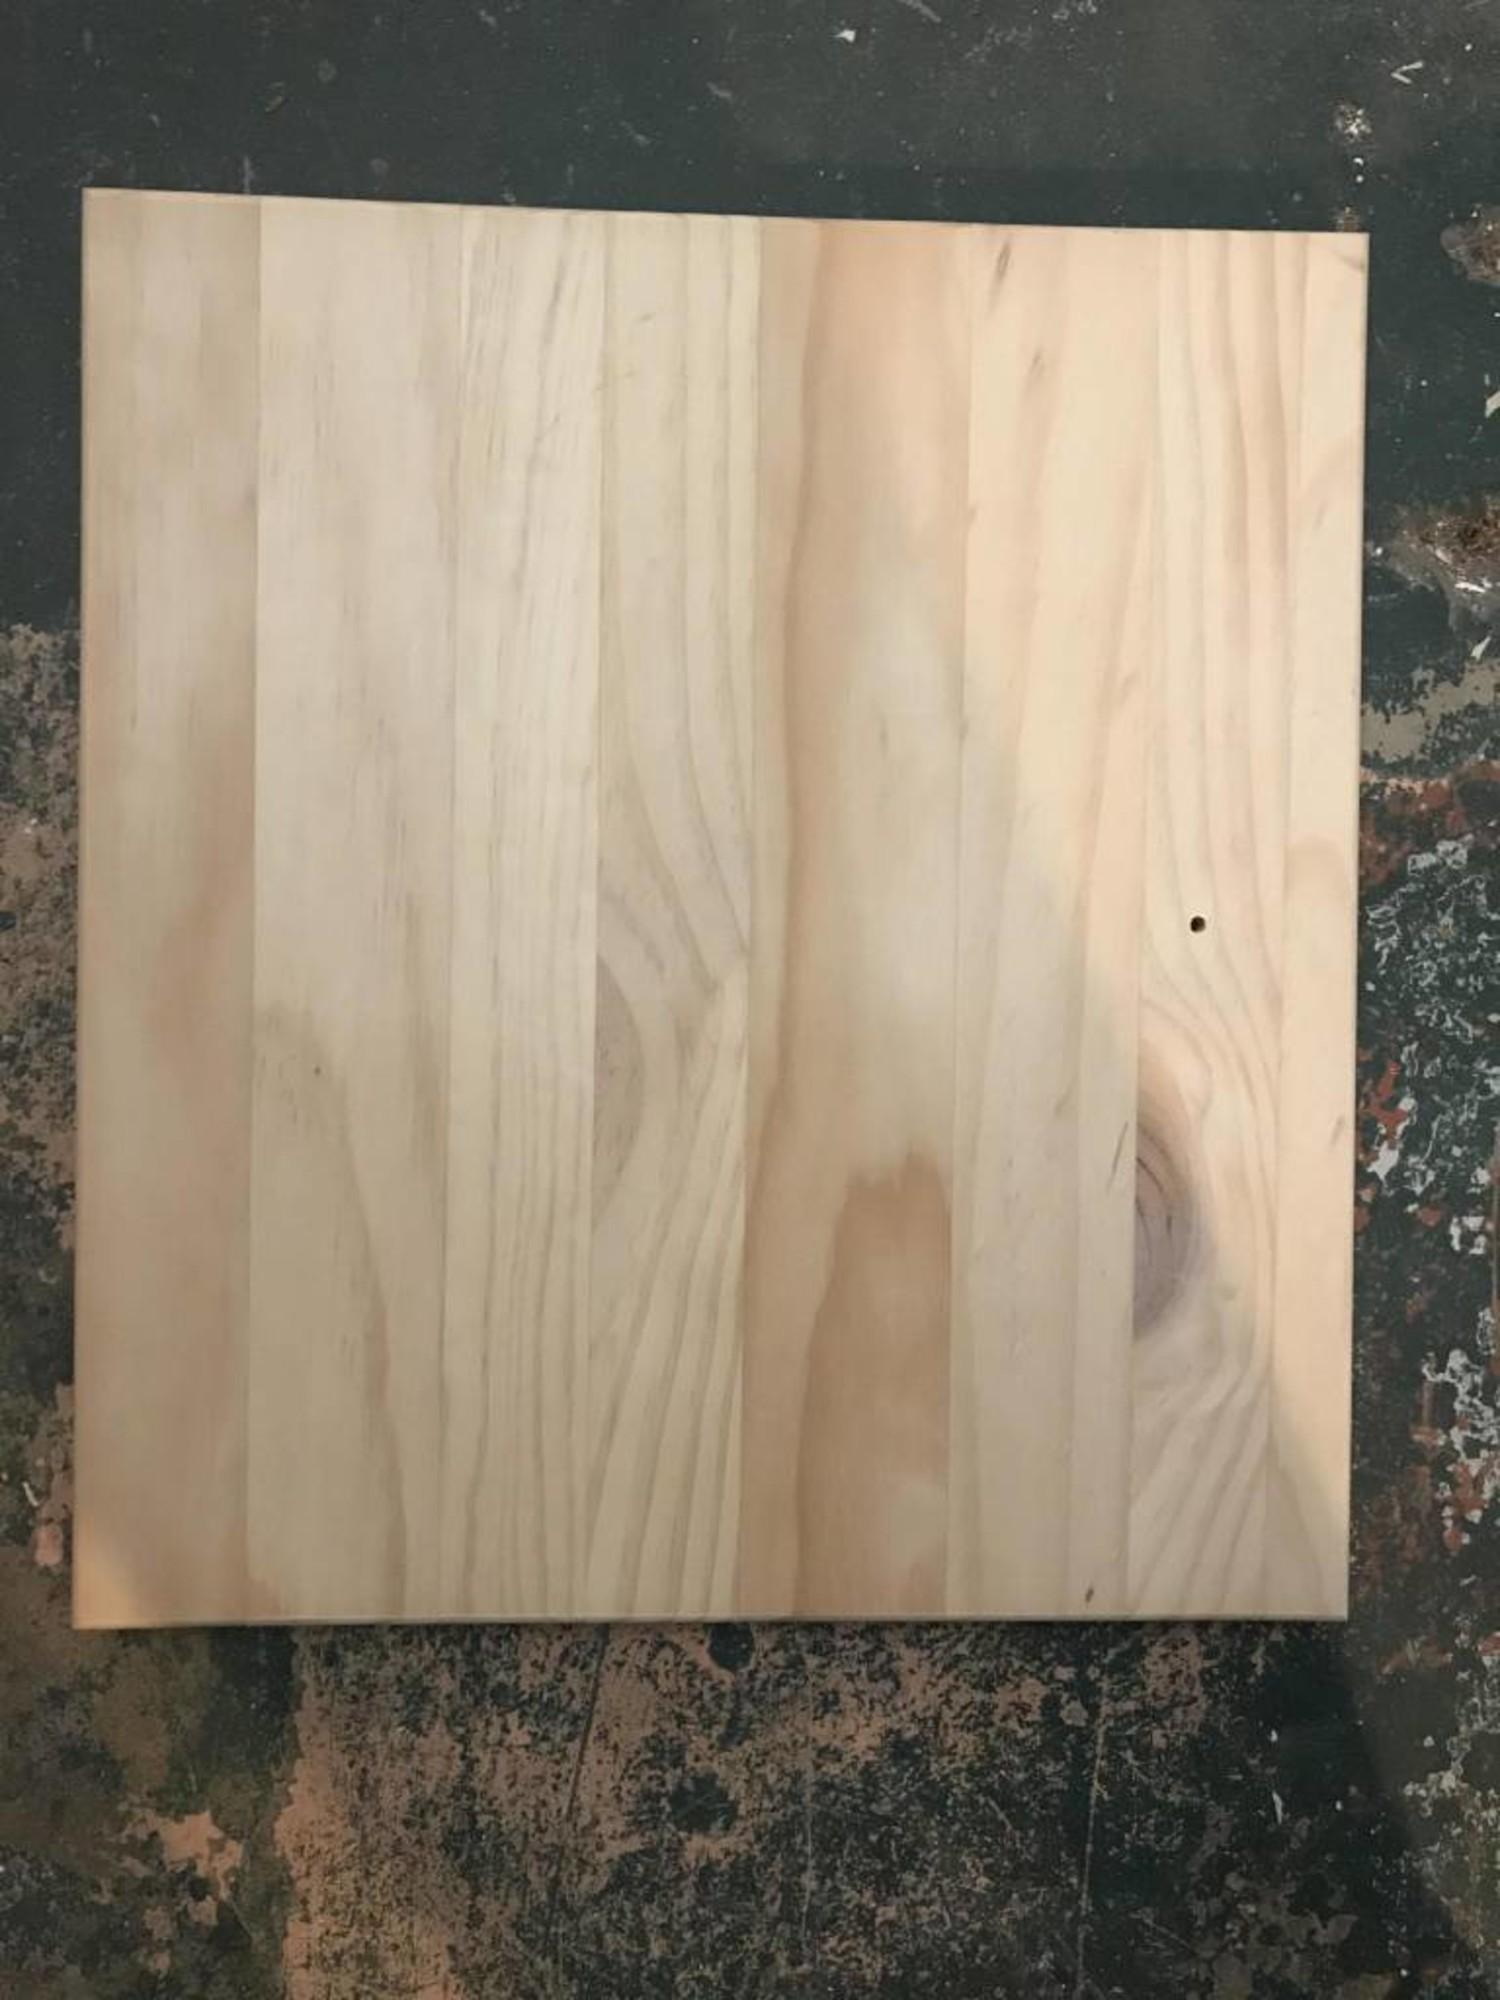 Sm Unfinished Cabinet Door 14 1 2 X 16